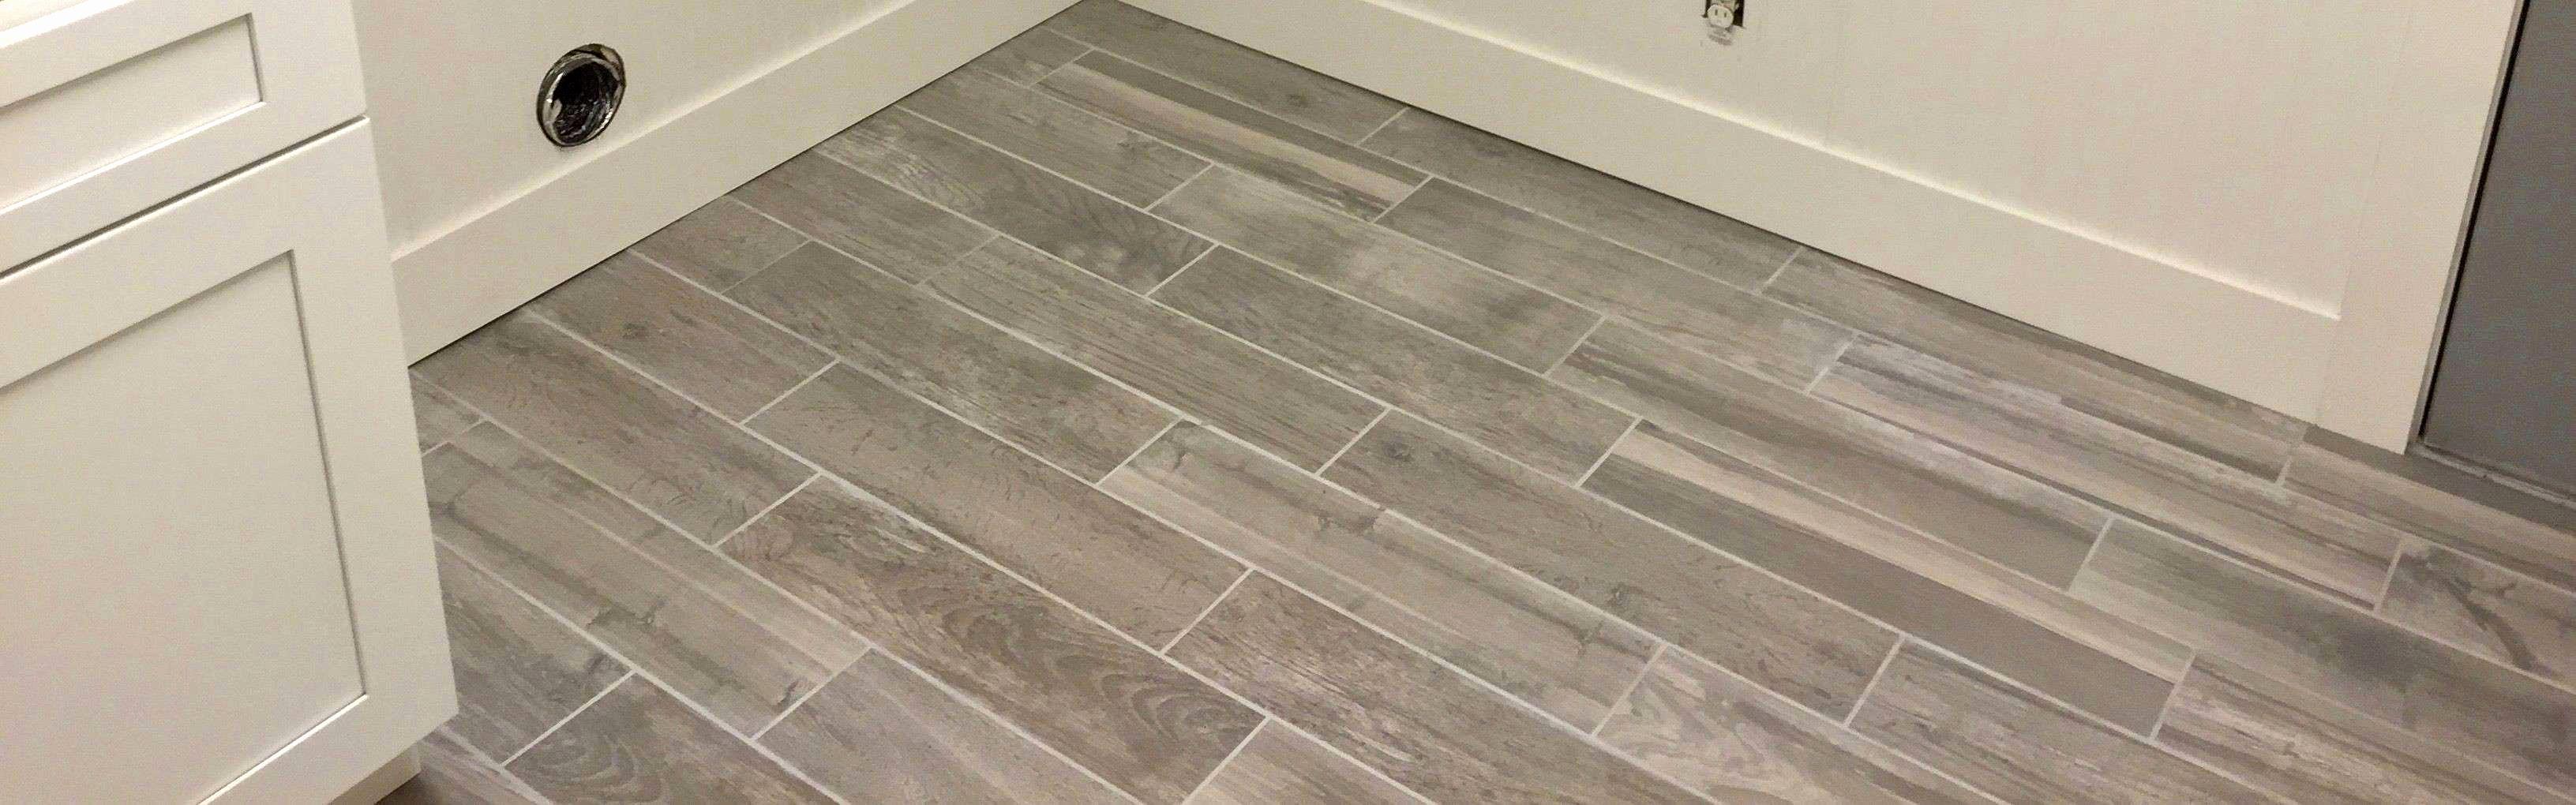 restaining hardwood floors of refinishing old hardwood floors 50 inspirational how to redo with refinishing old hardwood floors 50 inspirational how to redo hardwood floors 50 s